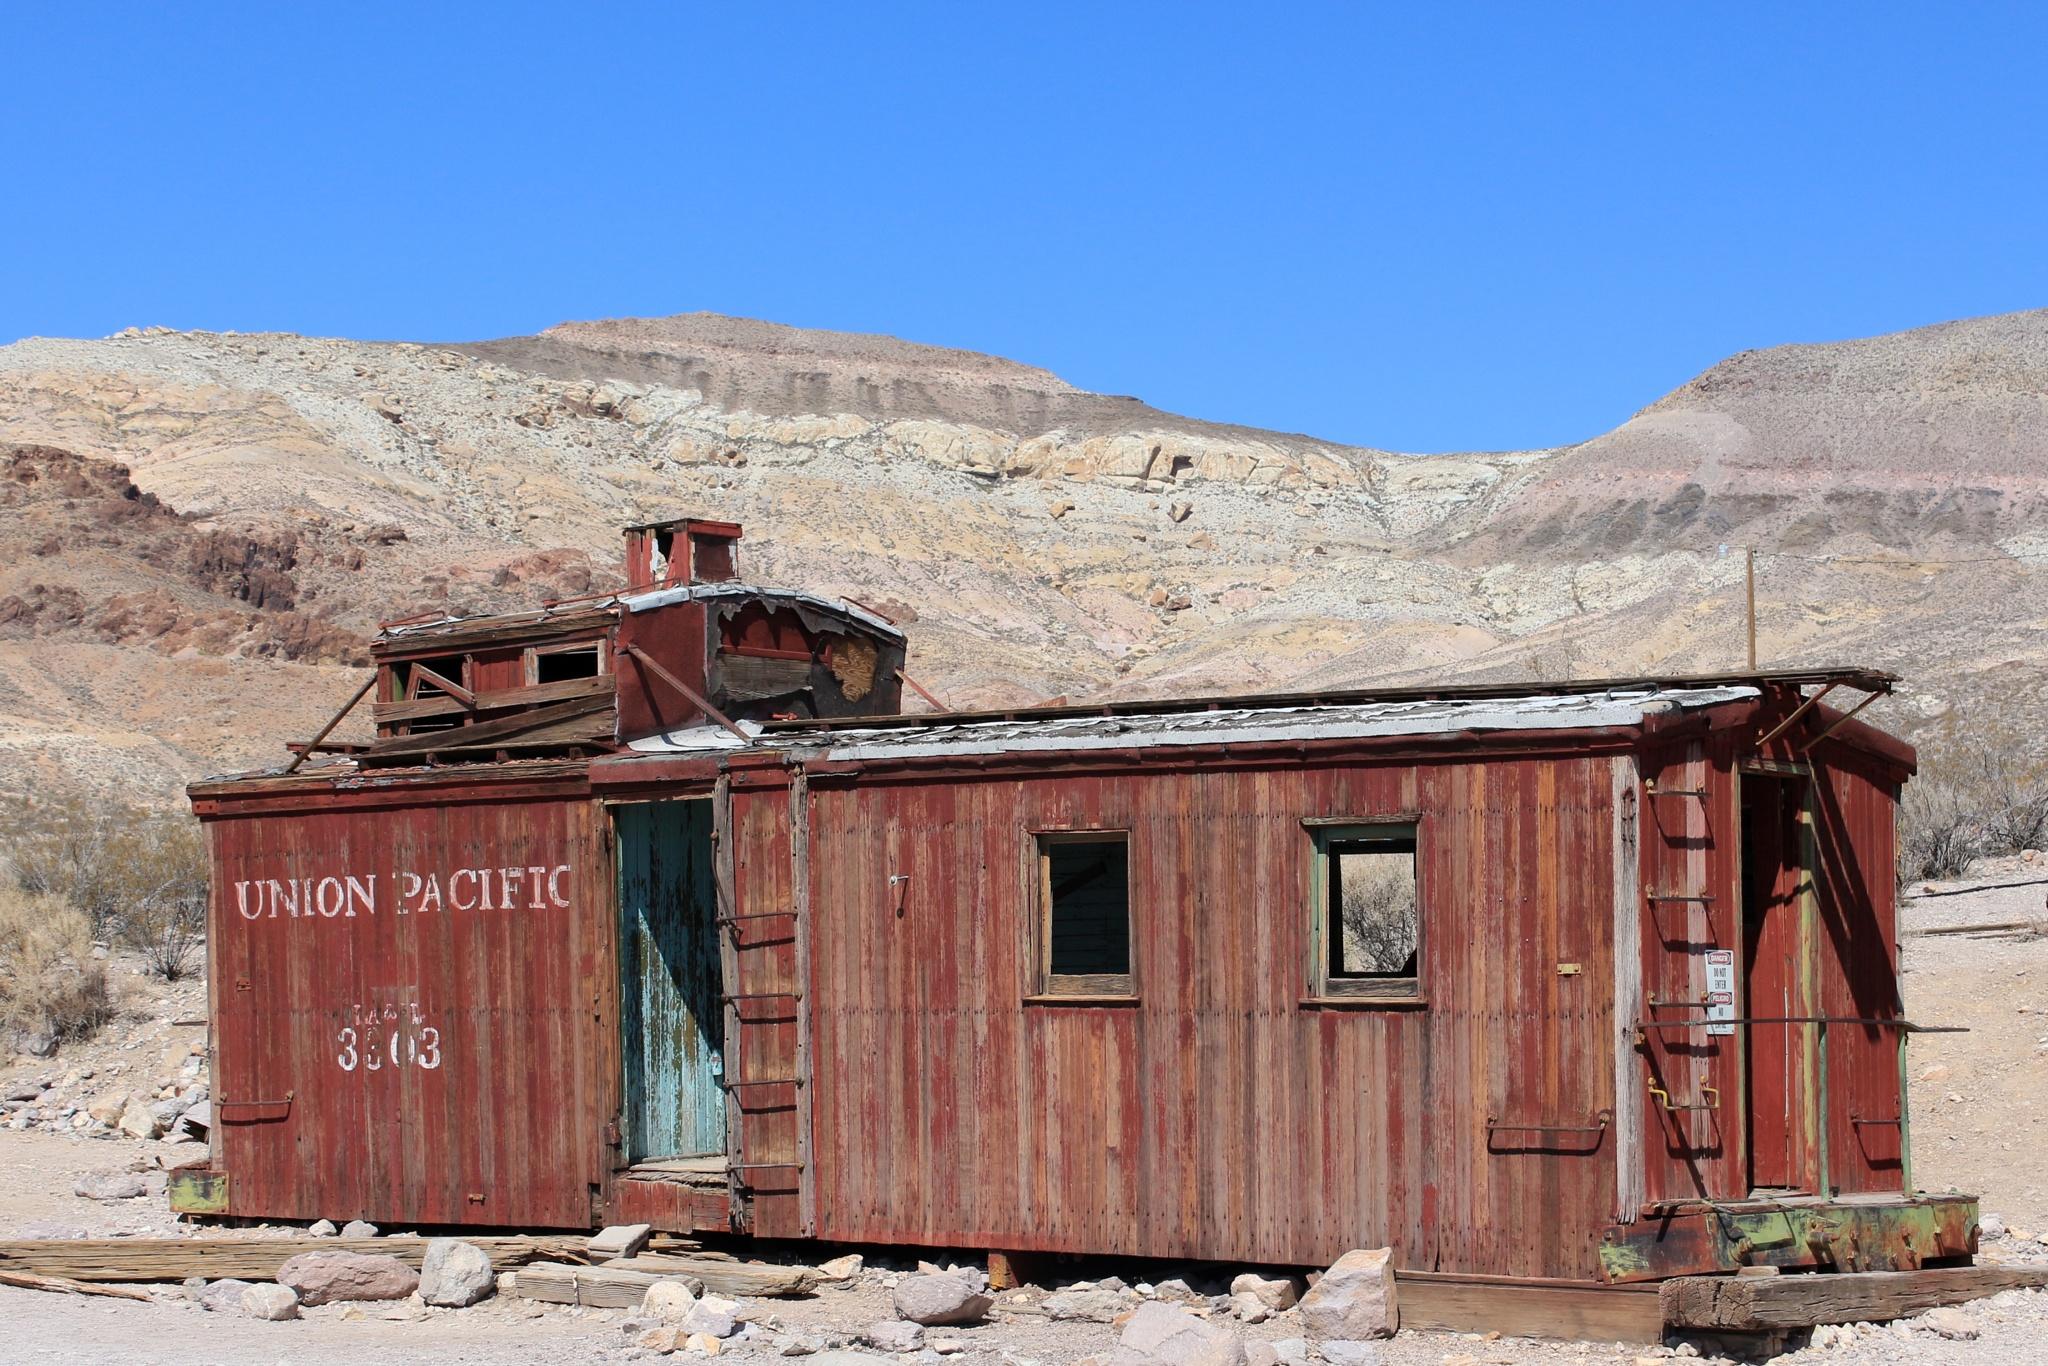 Union Pacific, Rhyolite Nevada by katze